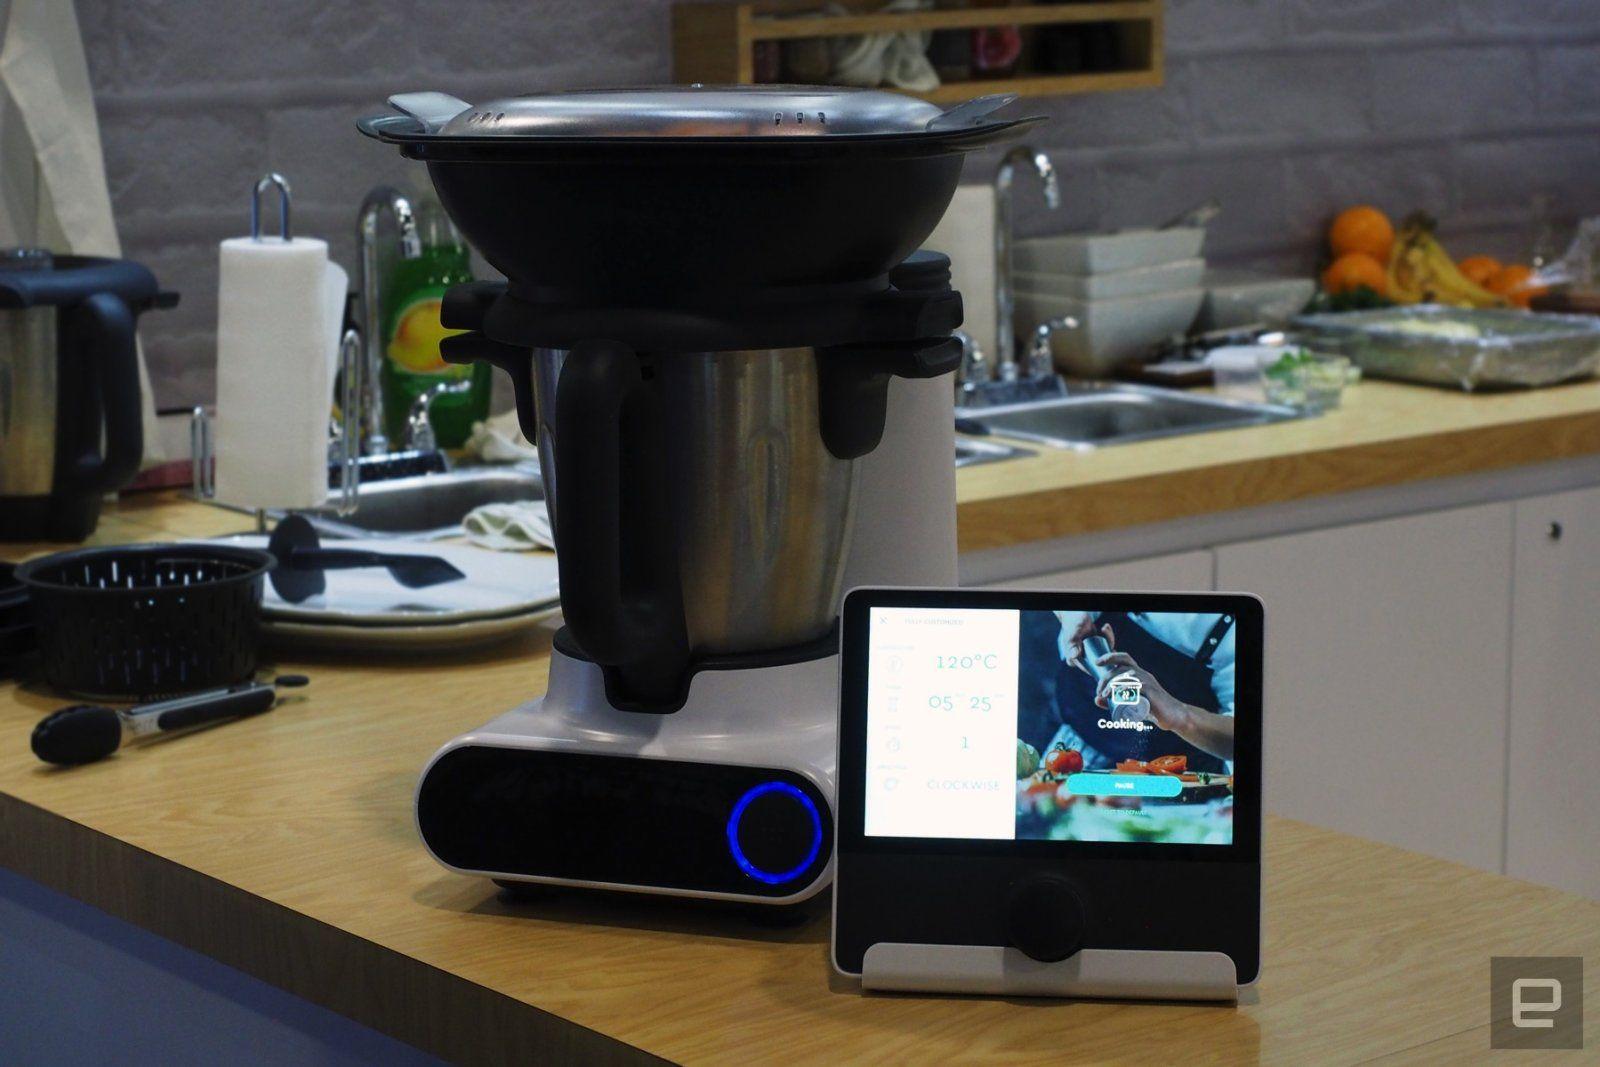 Smart Kitchen Appliances Of 2020